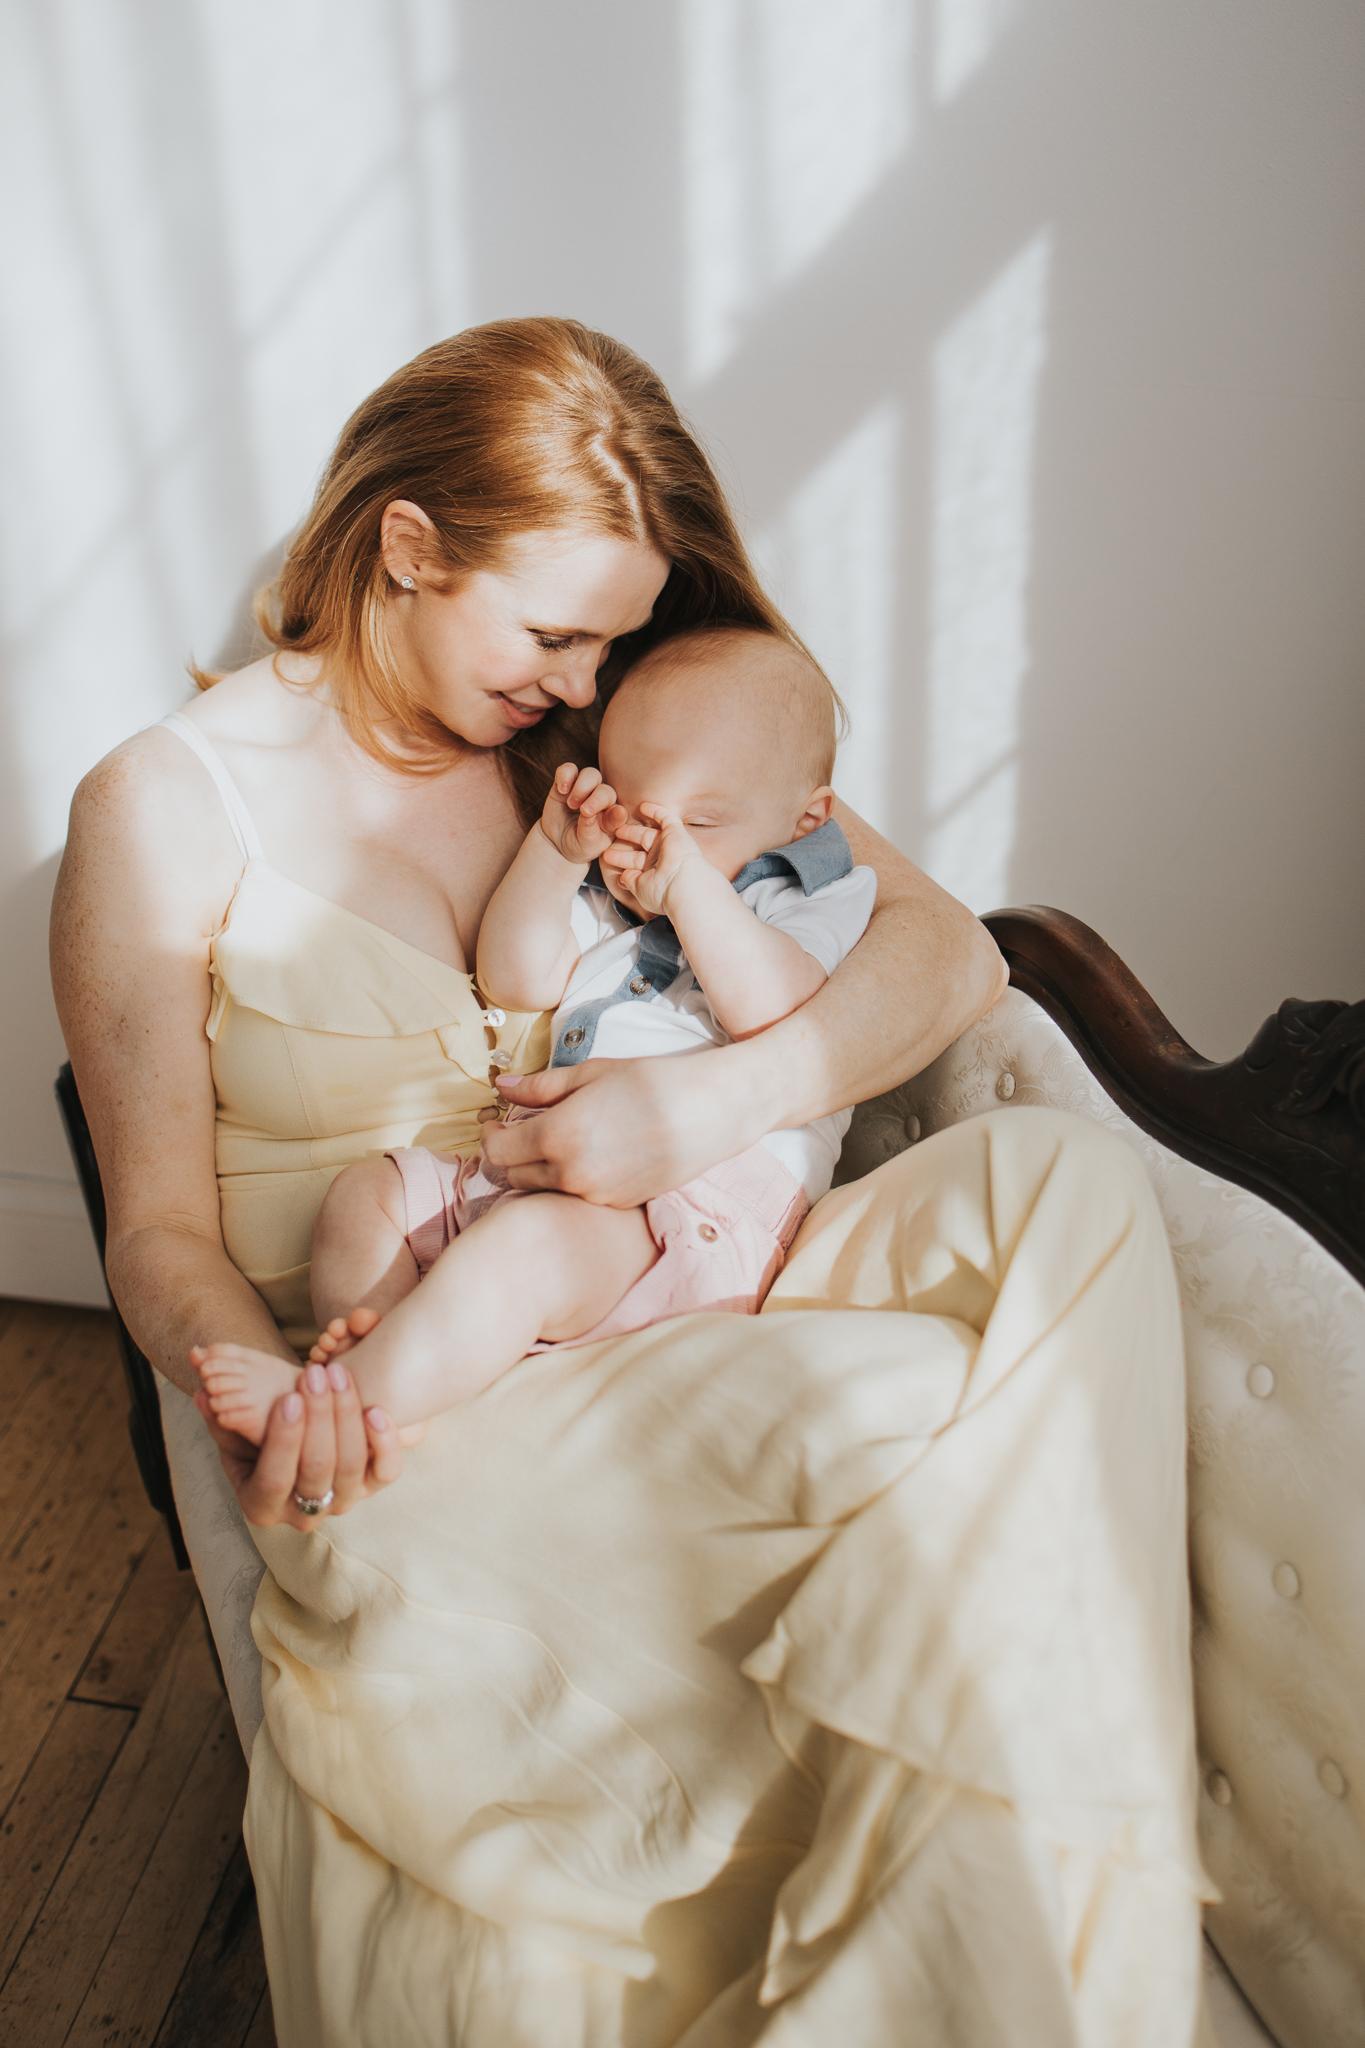 Baby sleeping on mommy's lap - Maple Grove Family Photographer